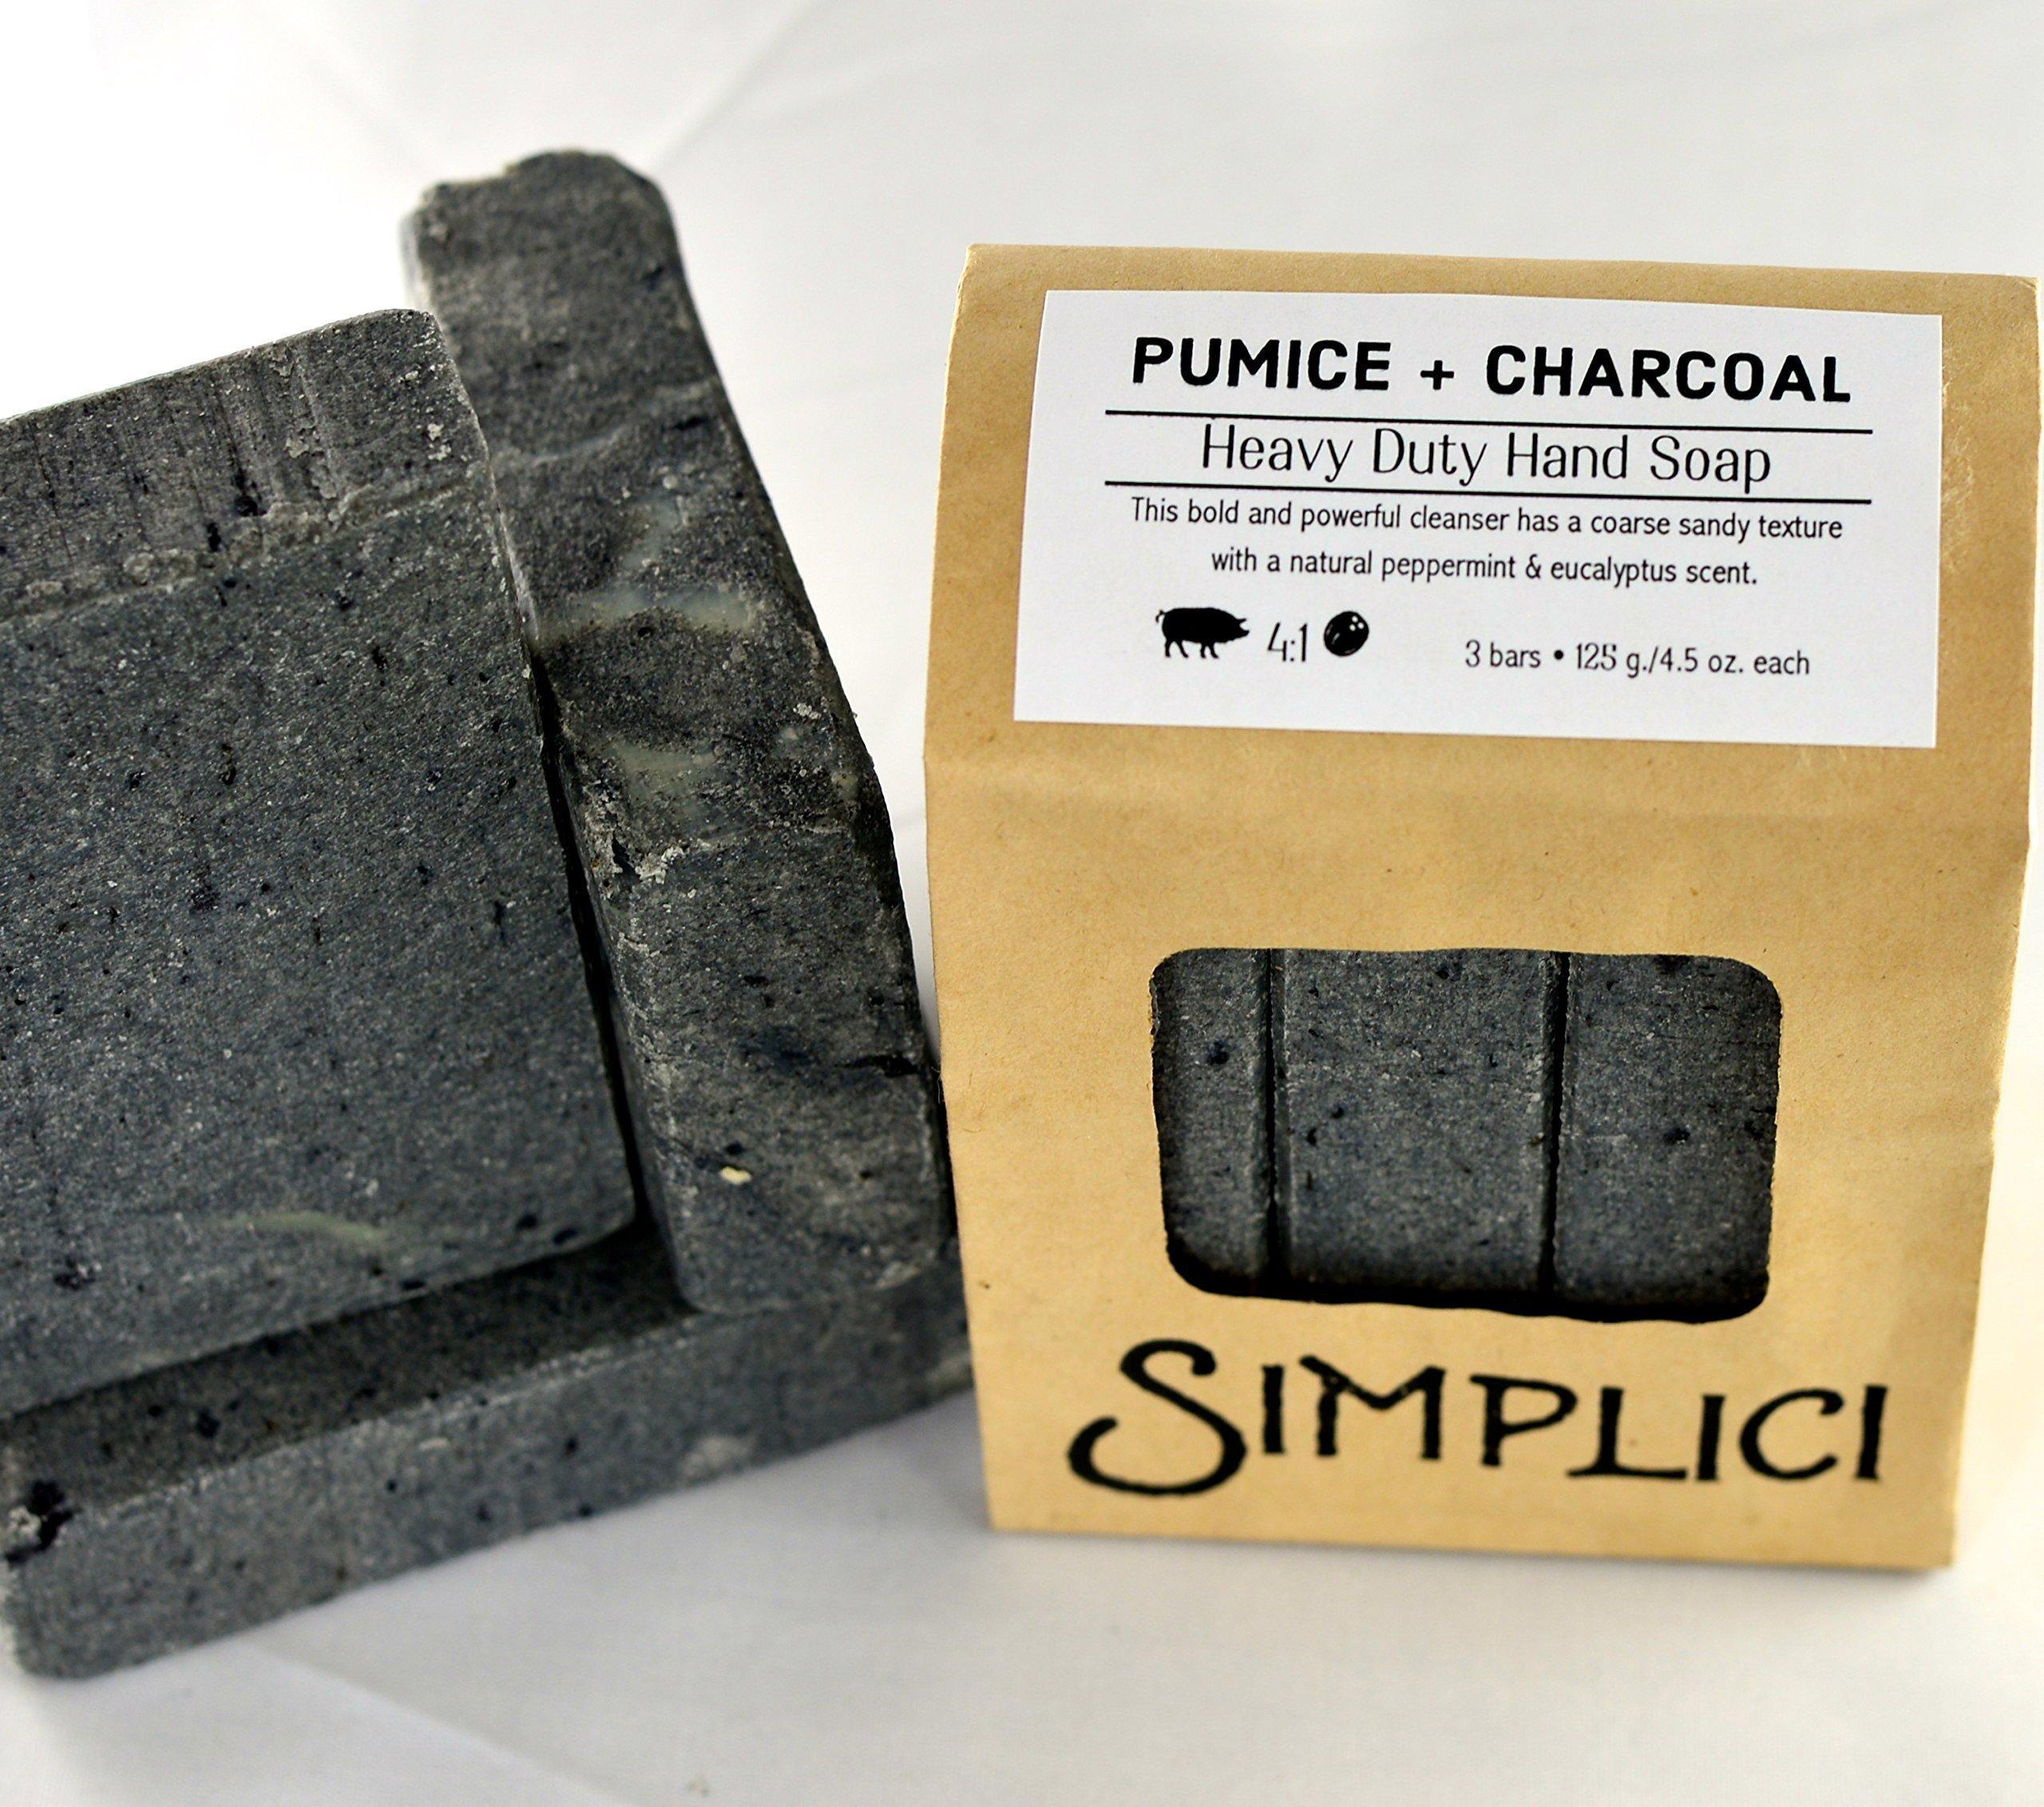 SIMPLICI Pumice + Charcoal + Shea Butter, Heavy Duty Hand Soap